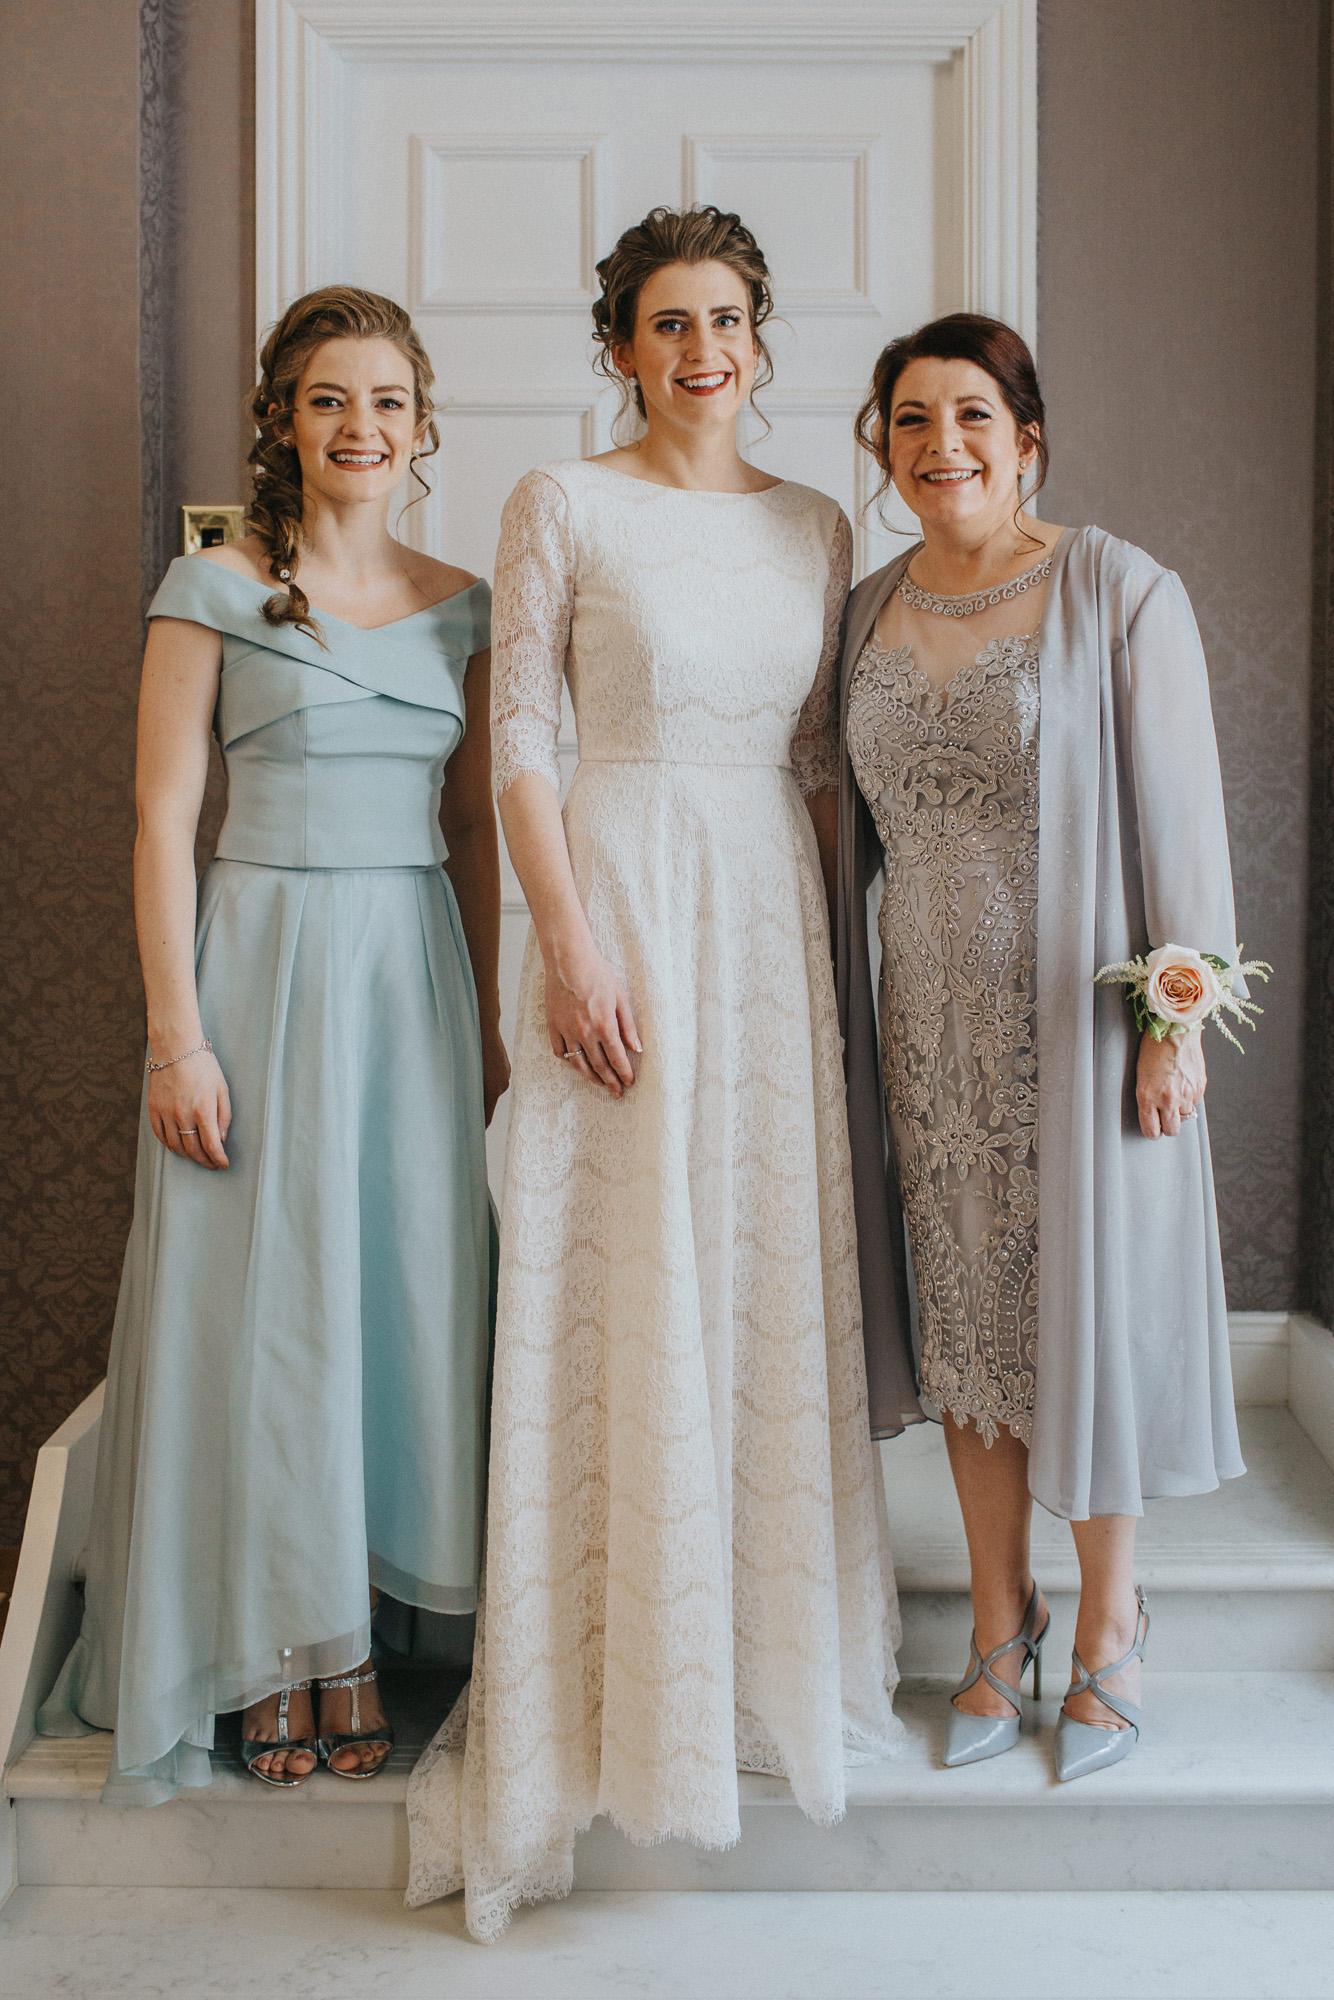 Kate-Beaumont-Lace-Flared-Dahlia-Gown-Leeds-Wedding-Bloom-Weddings-5.jpg